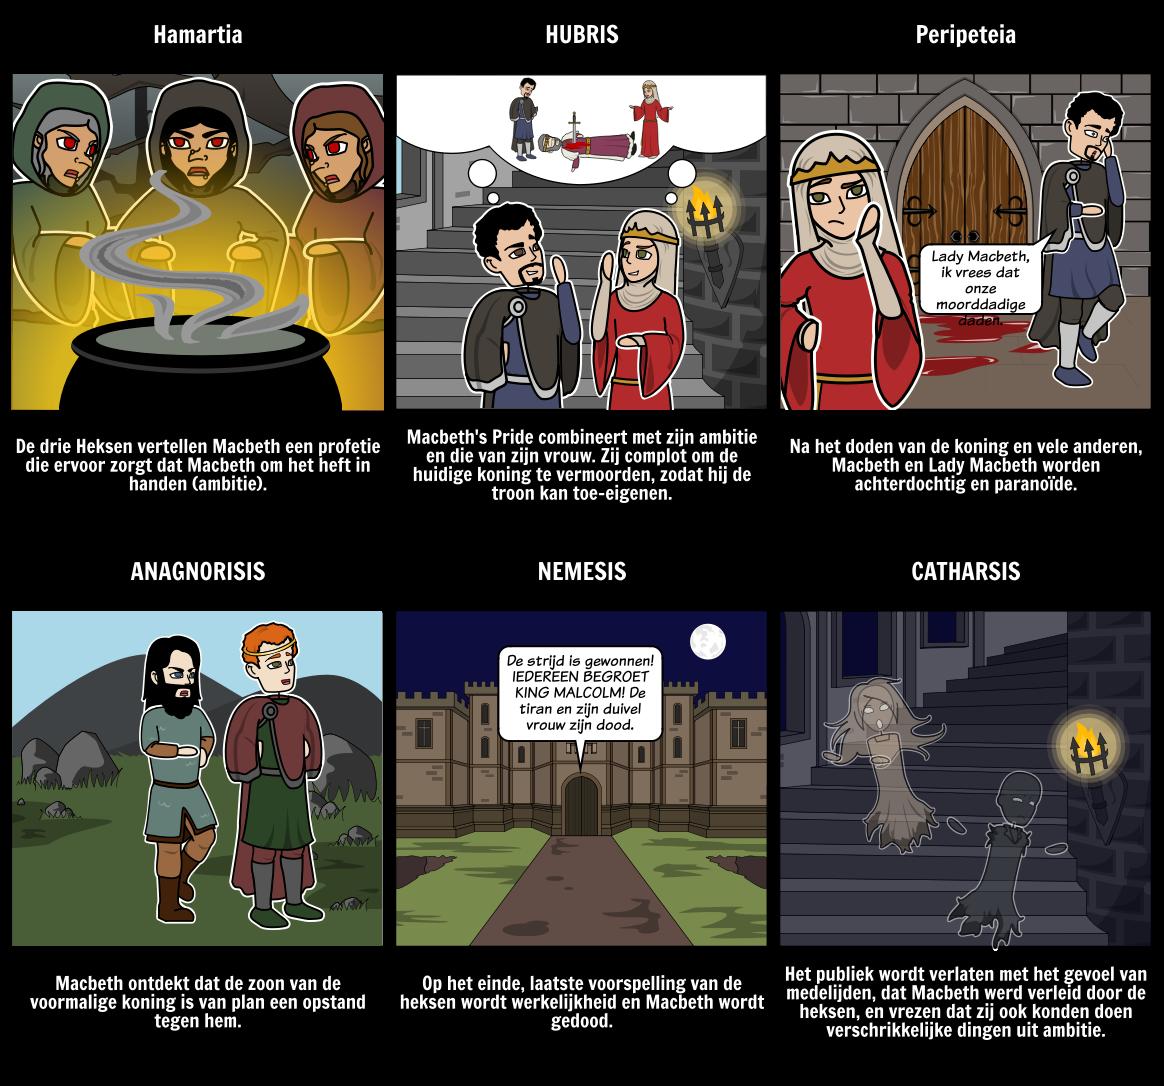 Macbeth Tragic Hero